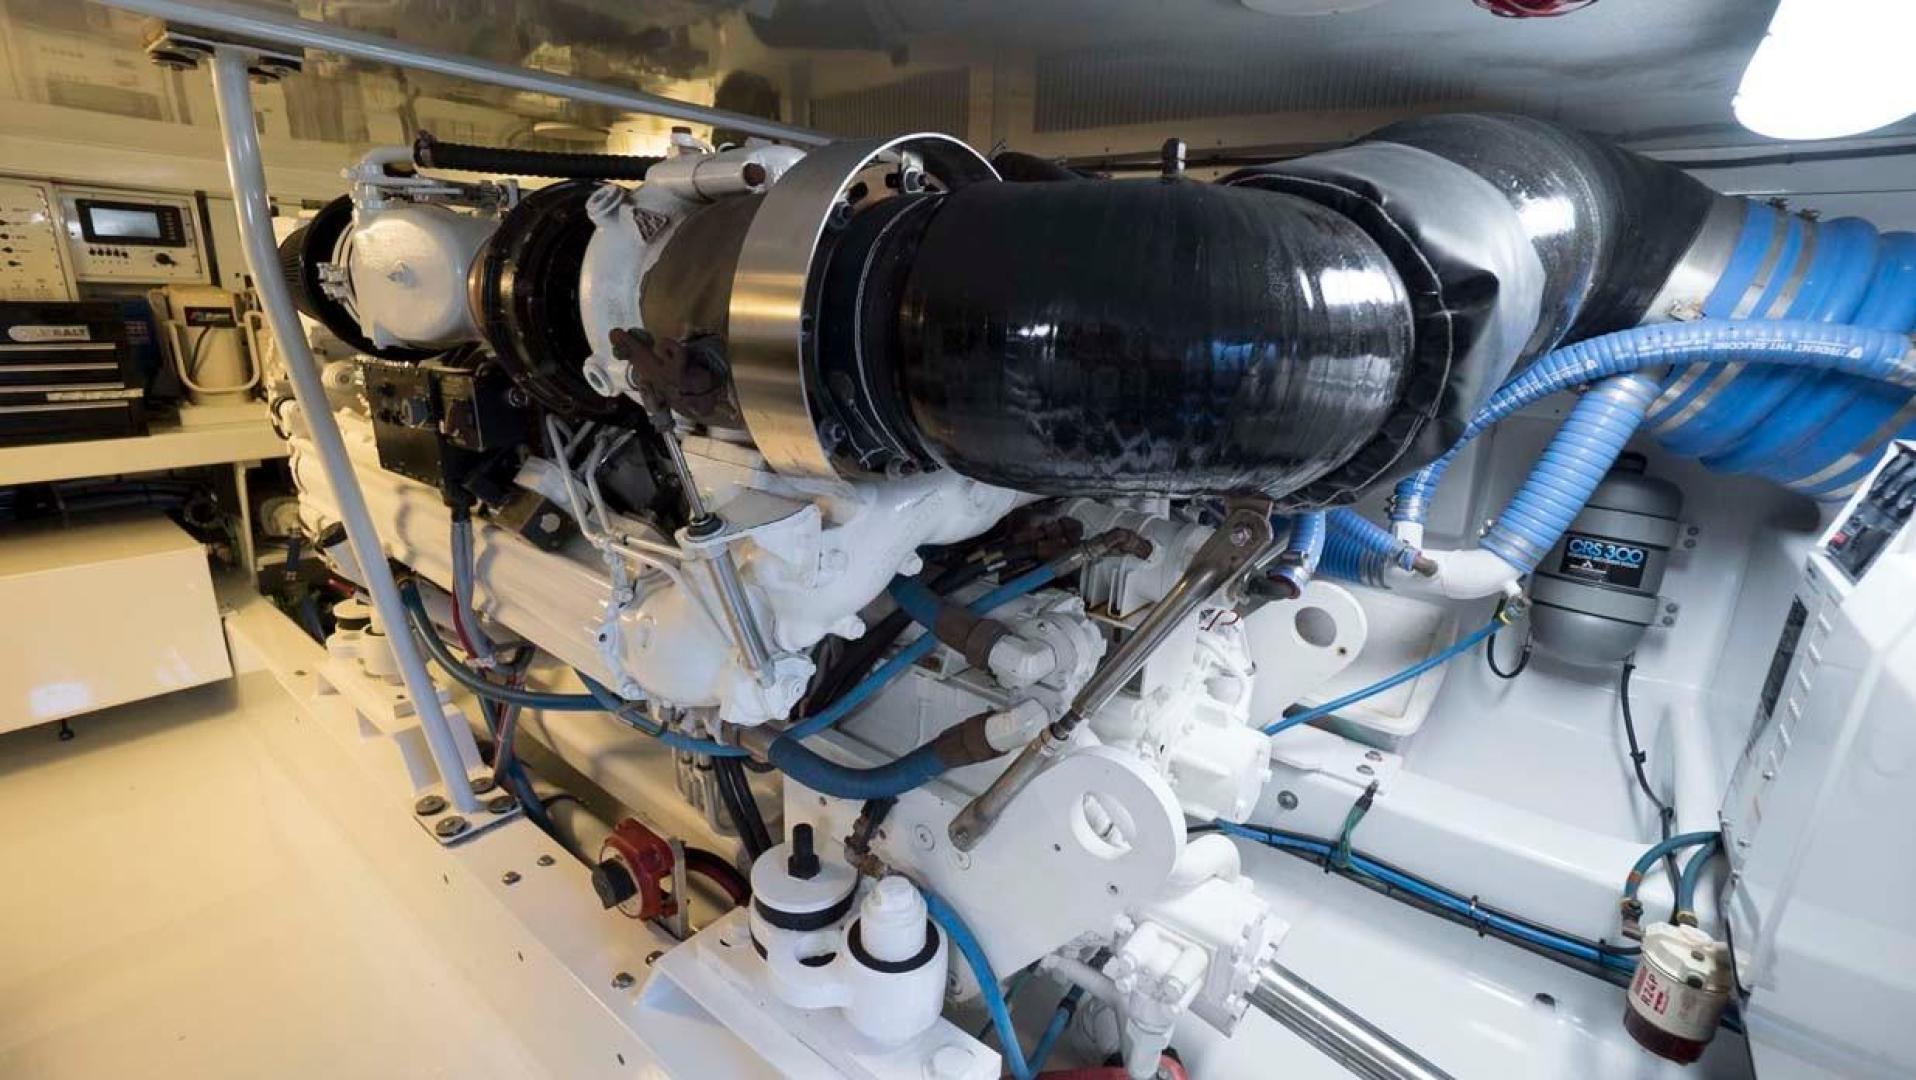 Jim-Smith-Custom-Convertible-Sportfish-2006-Silky-Palm-Beach-Florida-United-States-Stbd-MTU-Engine-924615